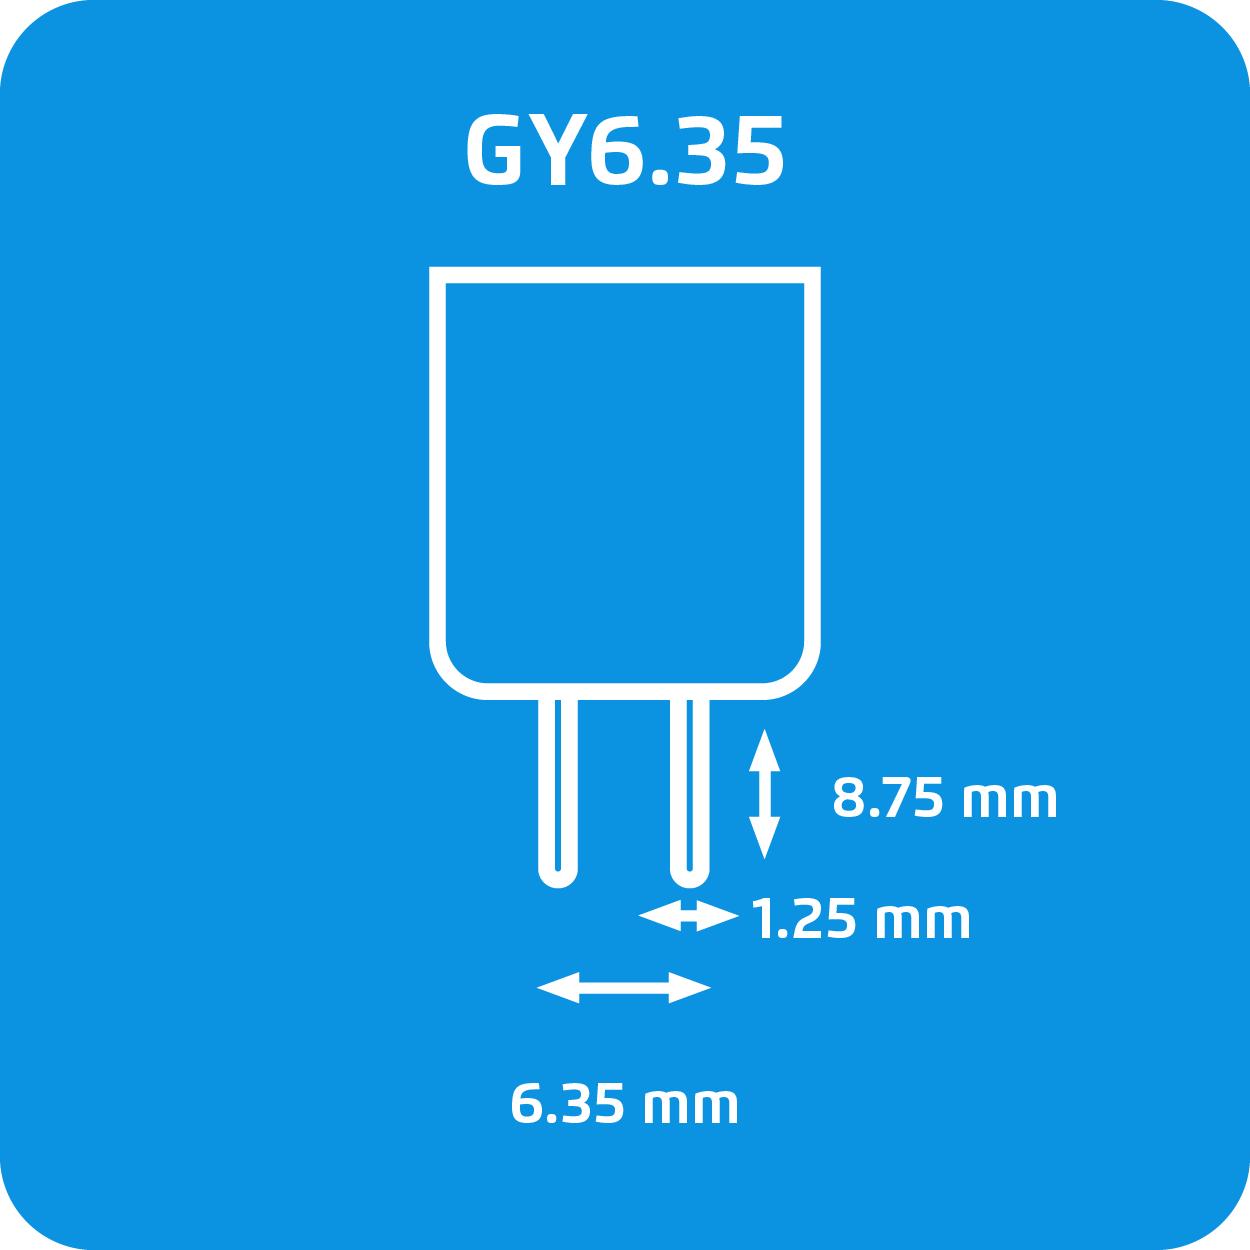 GY6.35